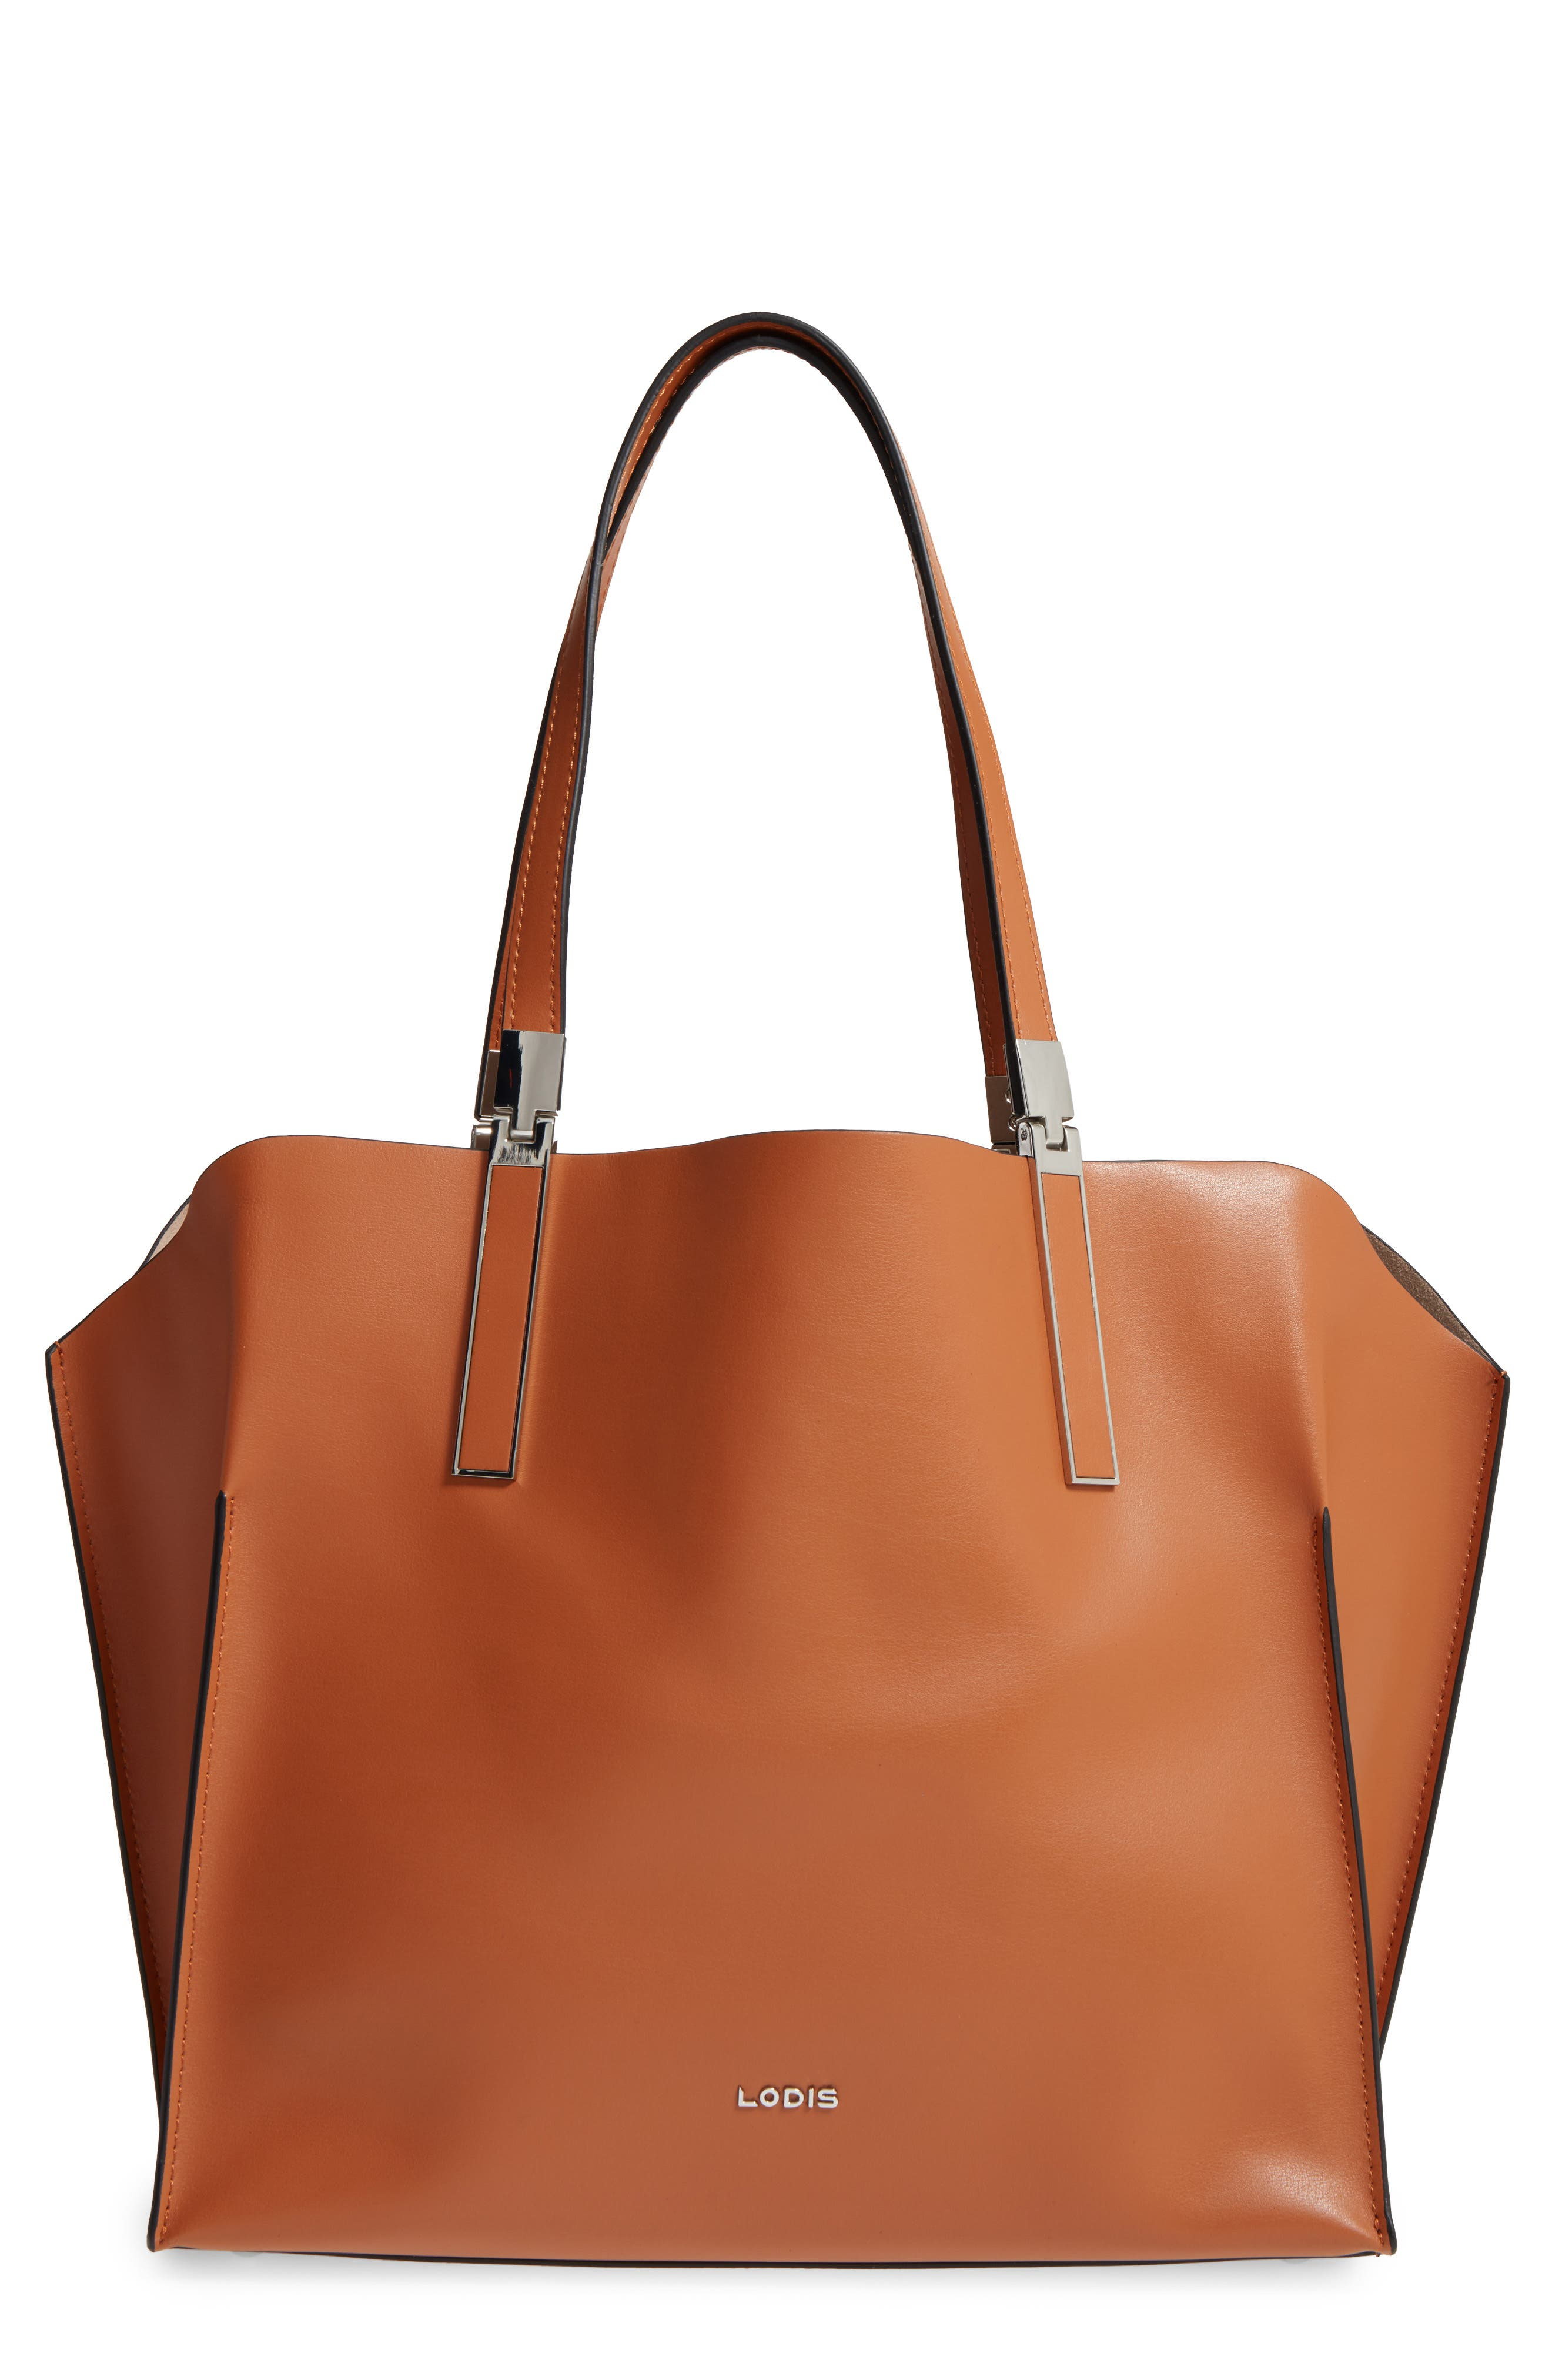 LODIS 'Blair Collection - Anita' Leather Tote